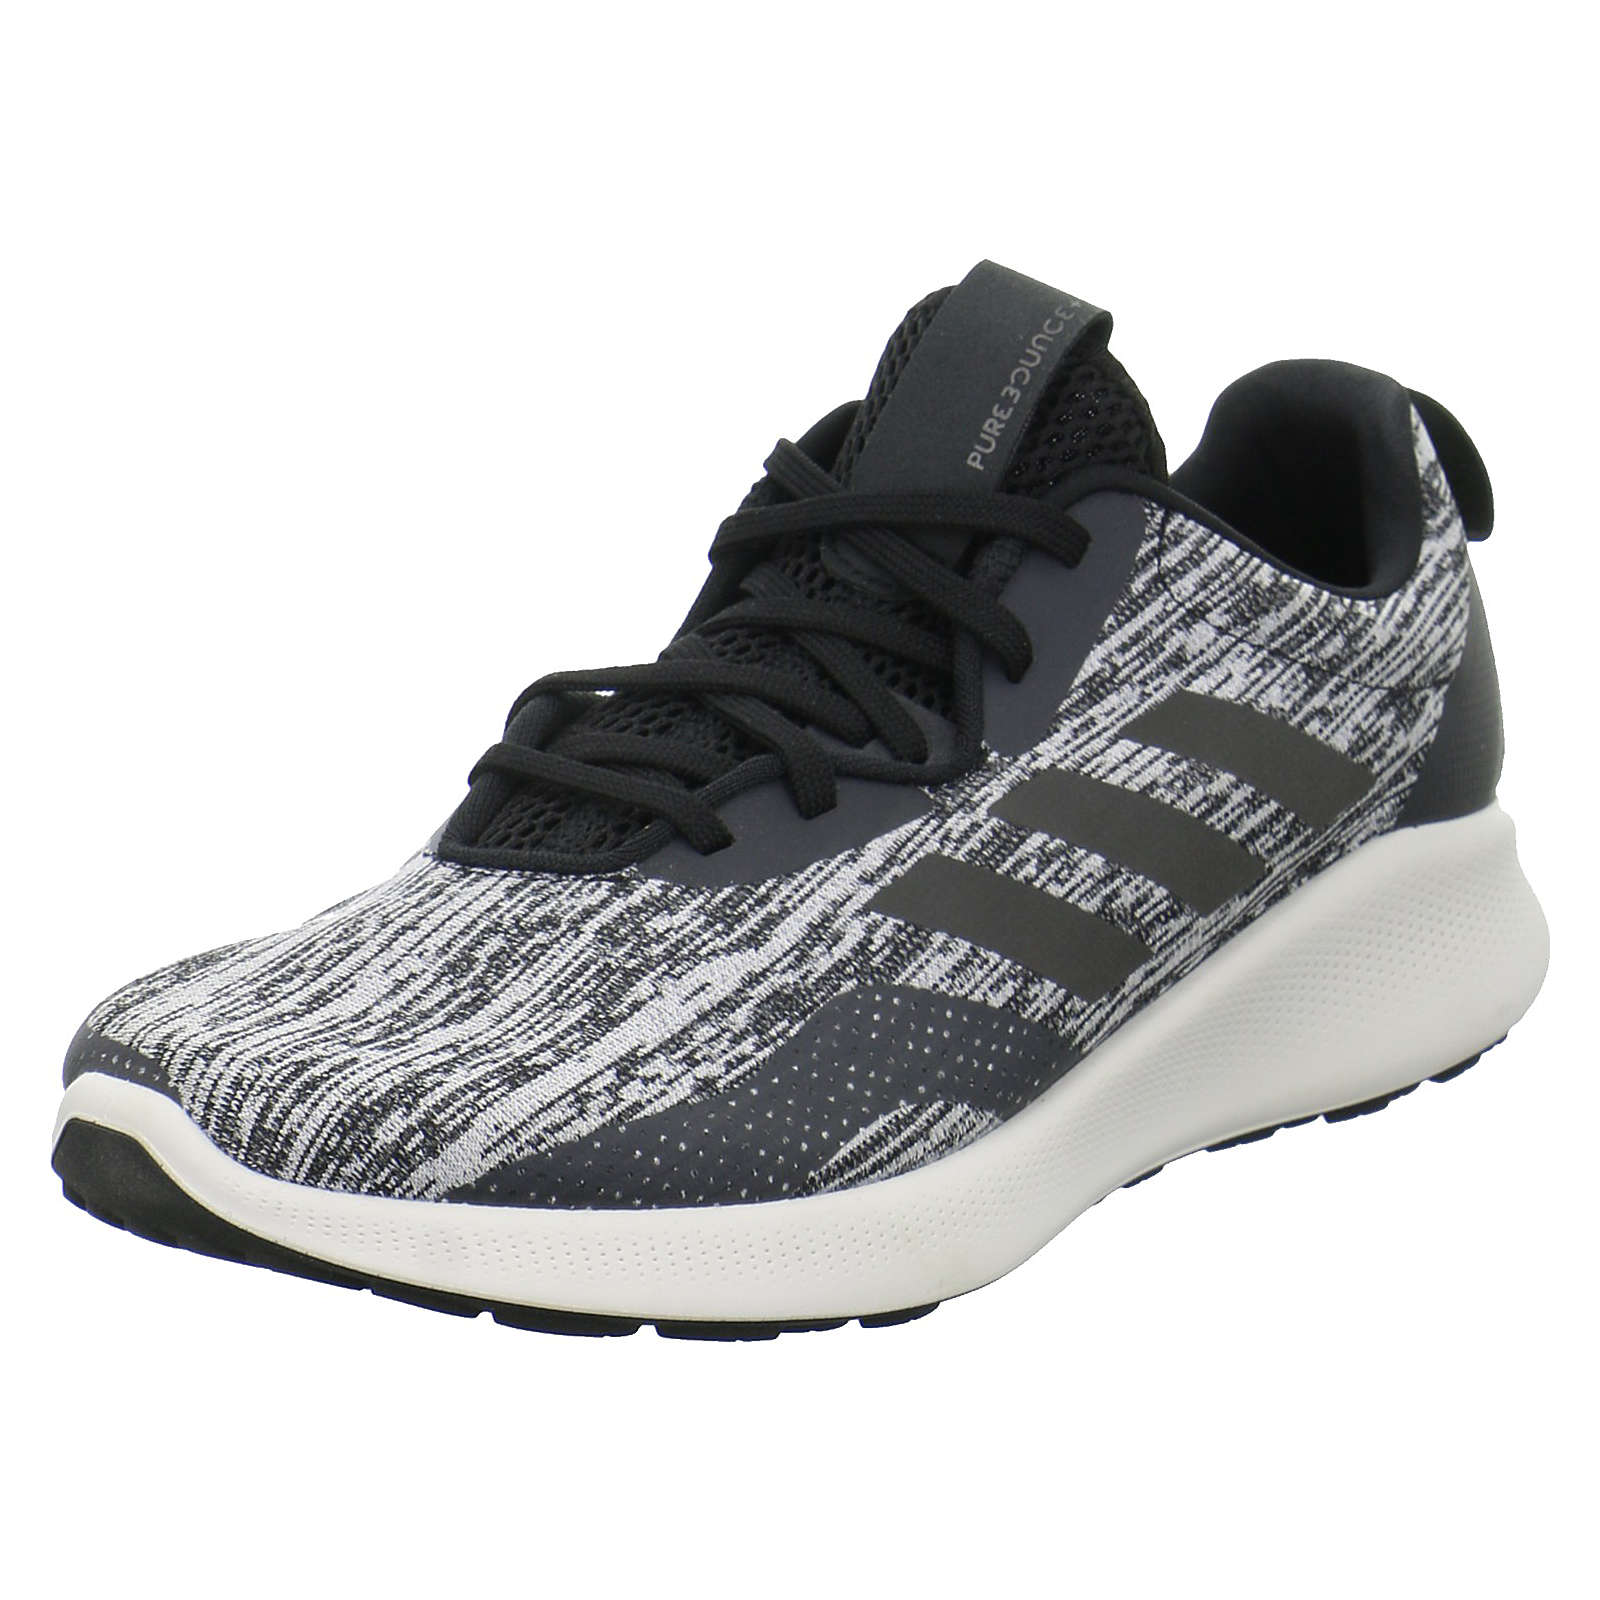 adidas Originals Sneaker Low purebounce+ street m Sneakers Low grau Herren Gr. 39